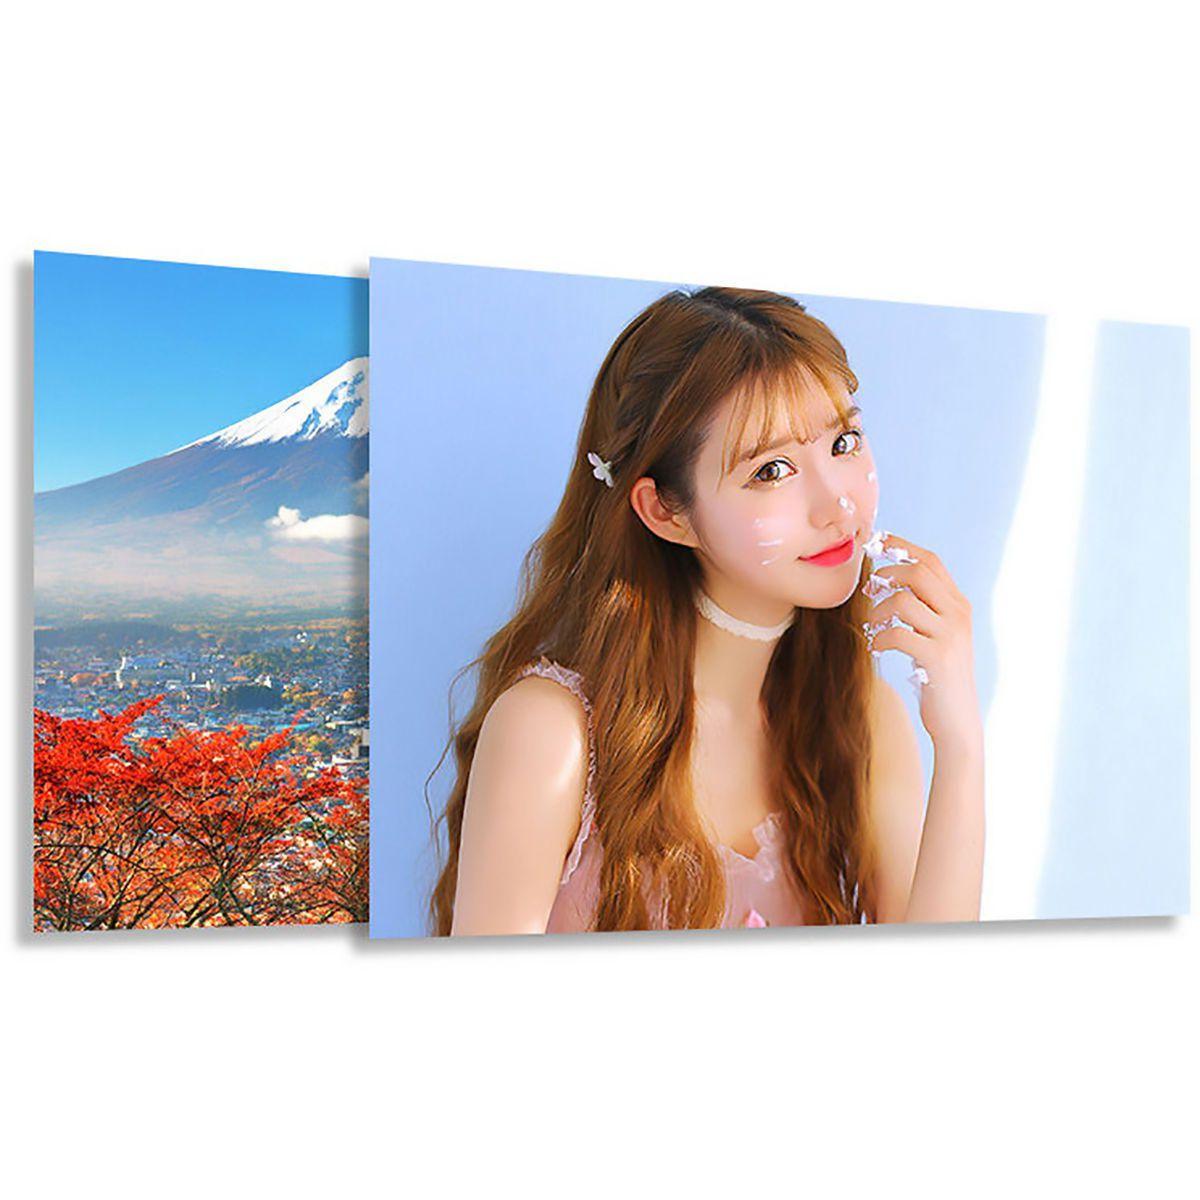 Papel Adesivo Fotográfico A3 297mm x 420mm Glossy 130g Branco Brilhante / 100 Folhas